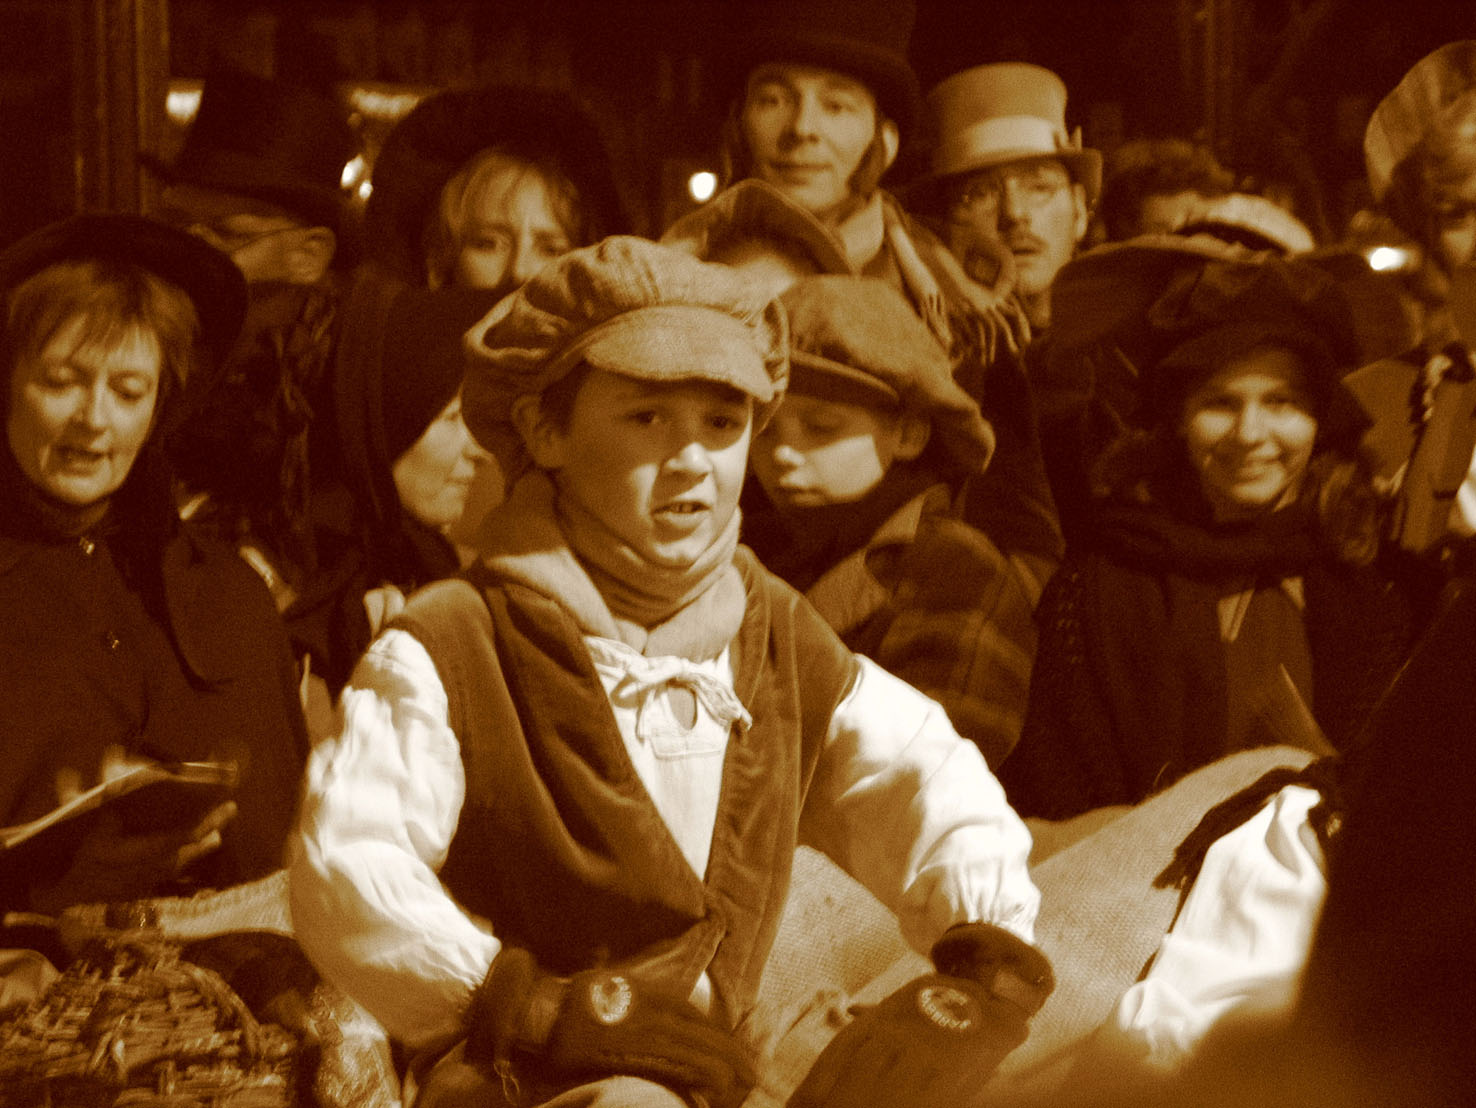 068 - Kerstmarkt Helmond 2003.jpg